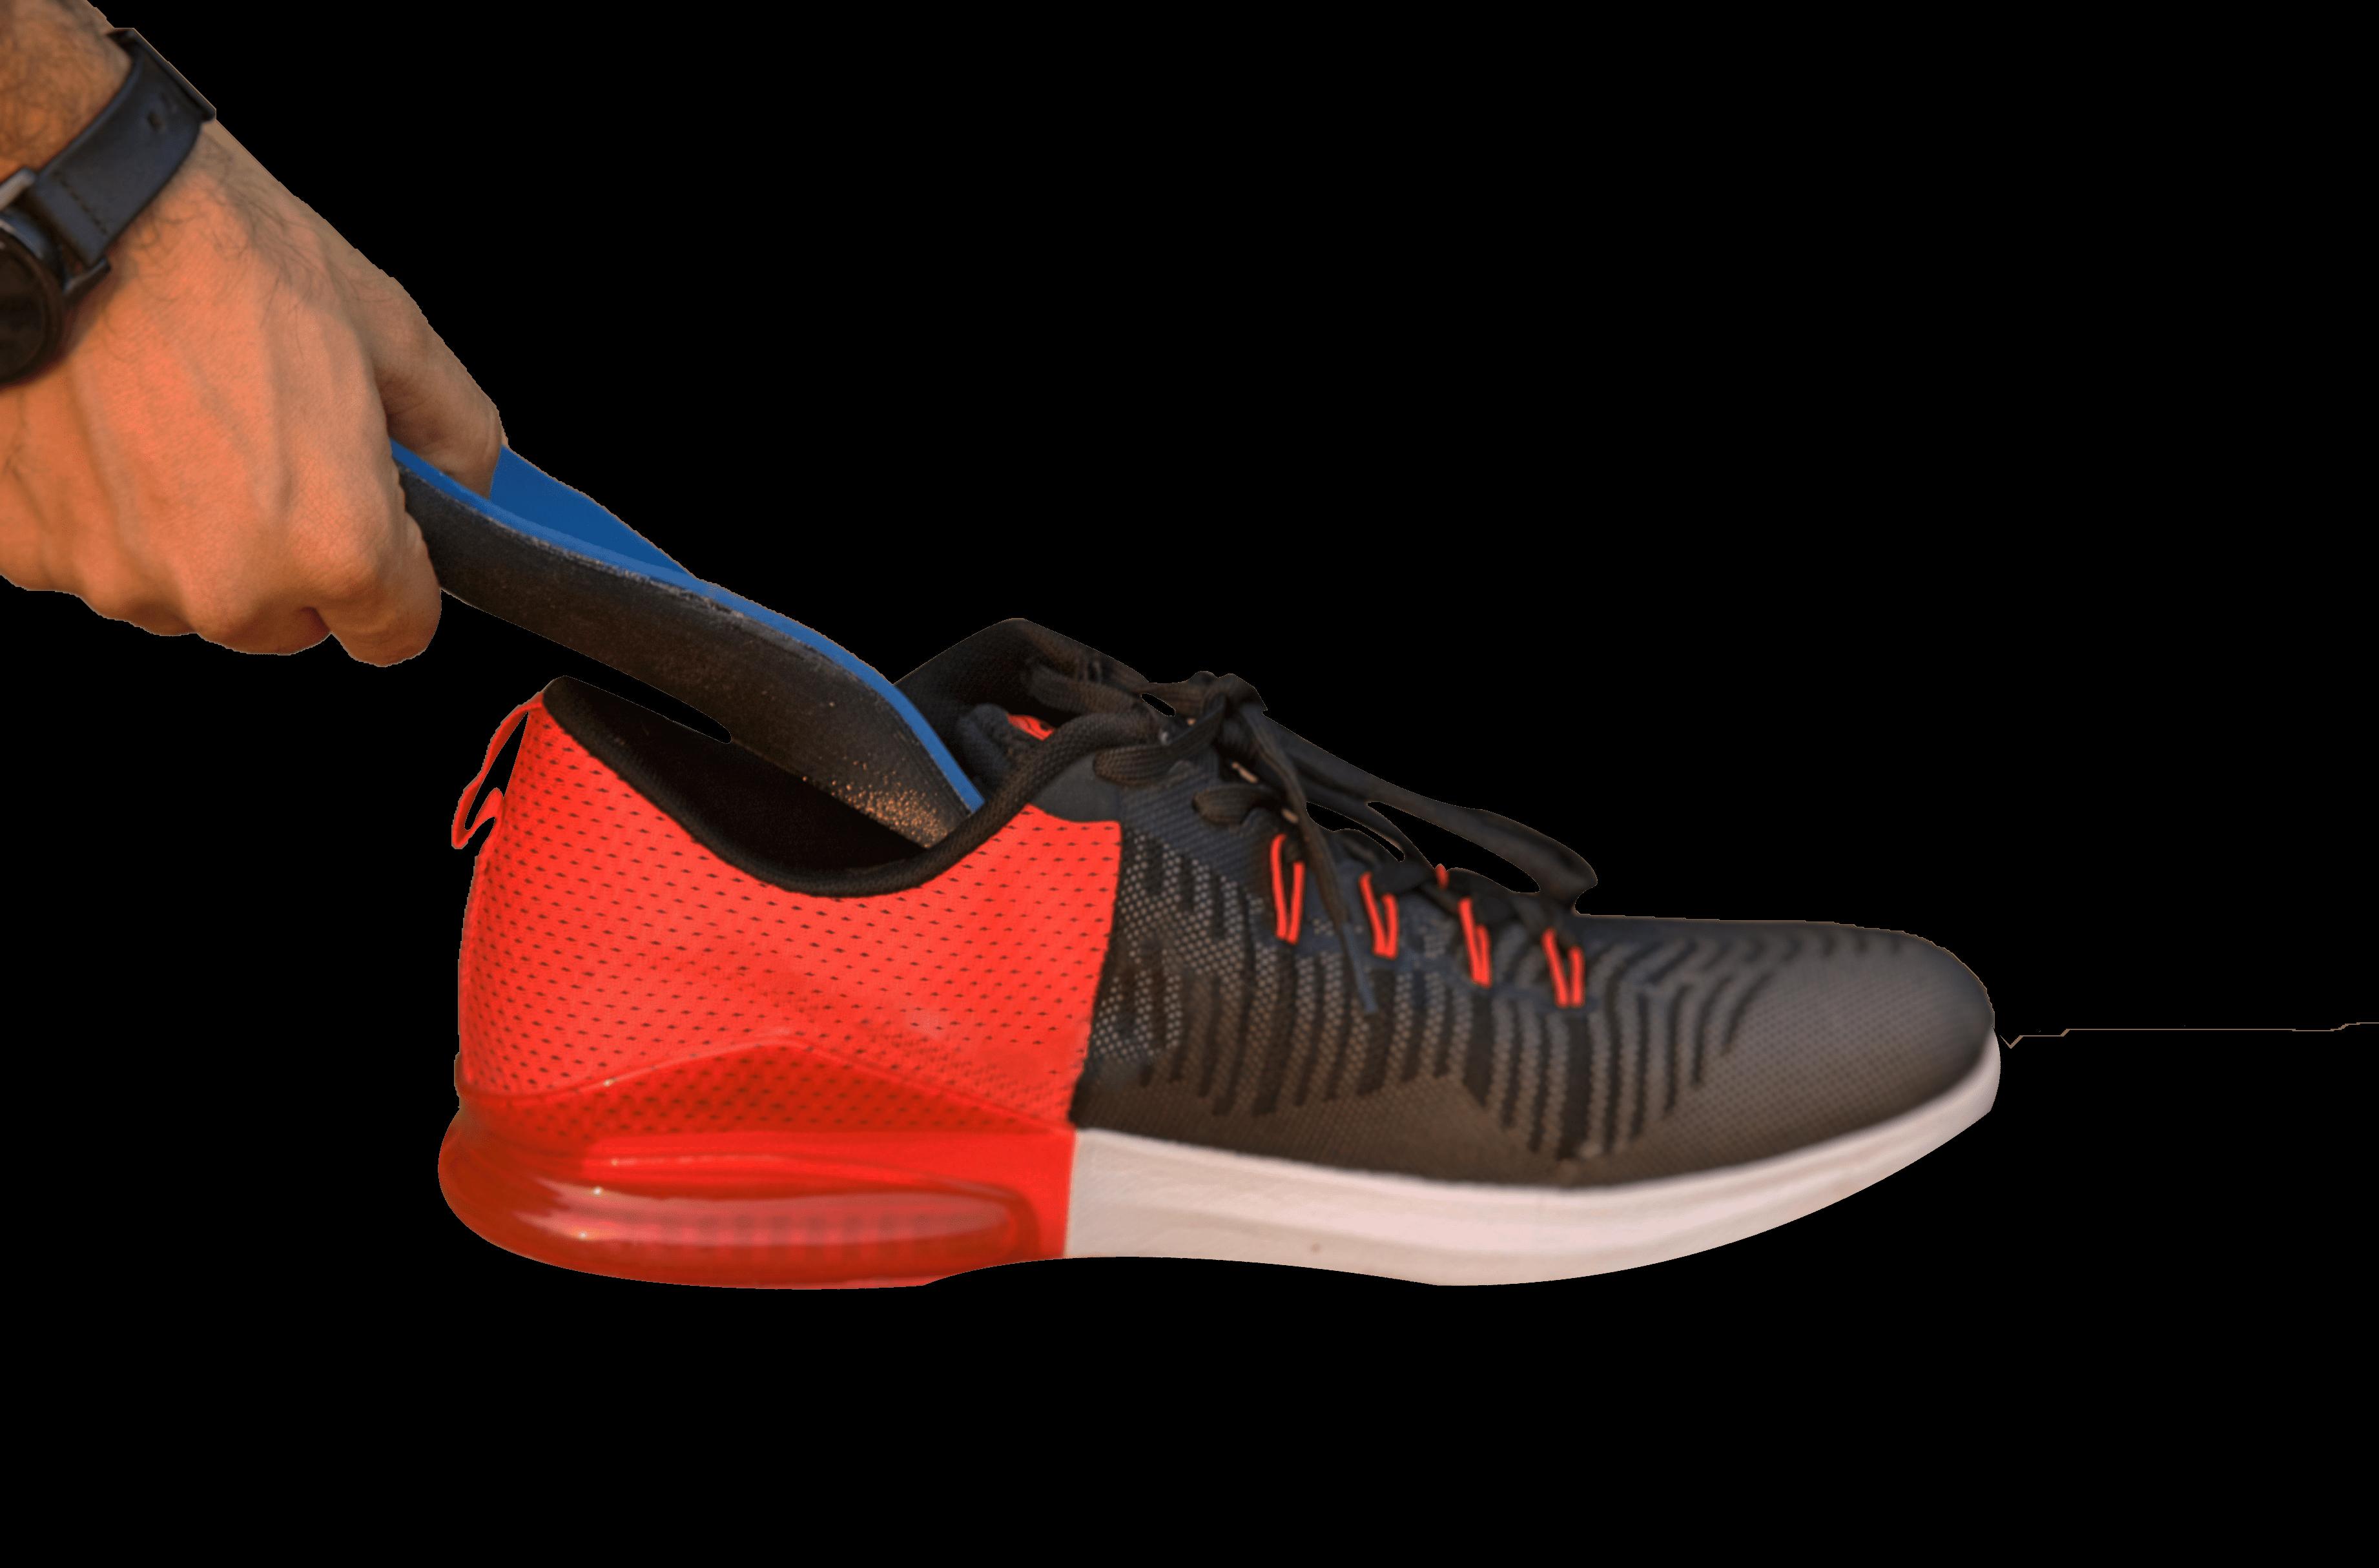 Shapecrunch custom insoles for sports, Custom insoles for running, Custom insoles for marathon